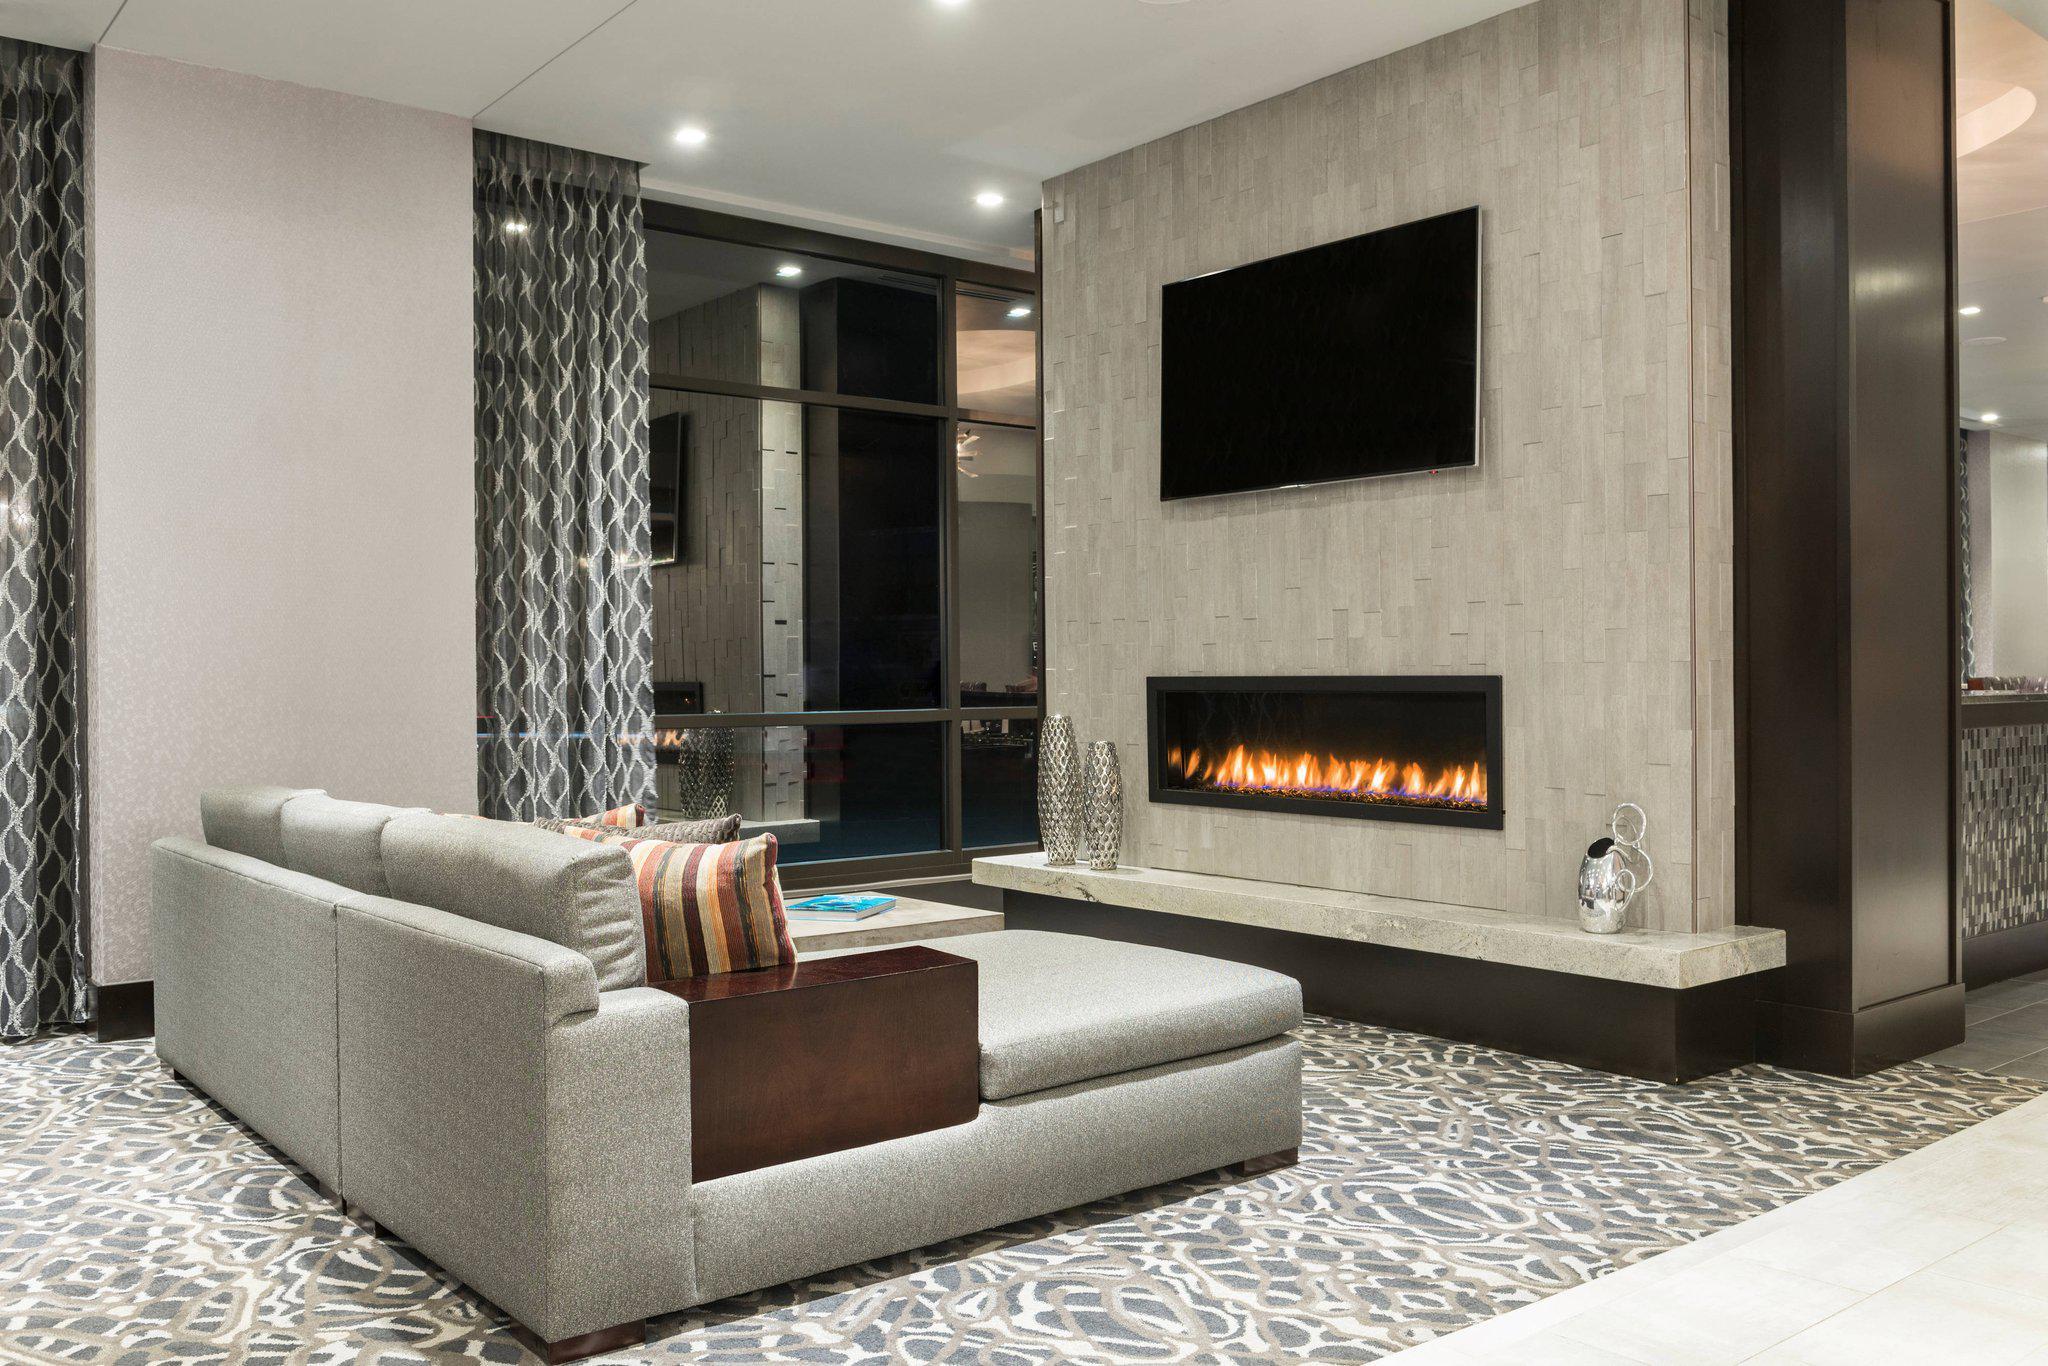 Fairfield Inn & Suites by Marriott Boston Cambridge